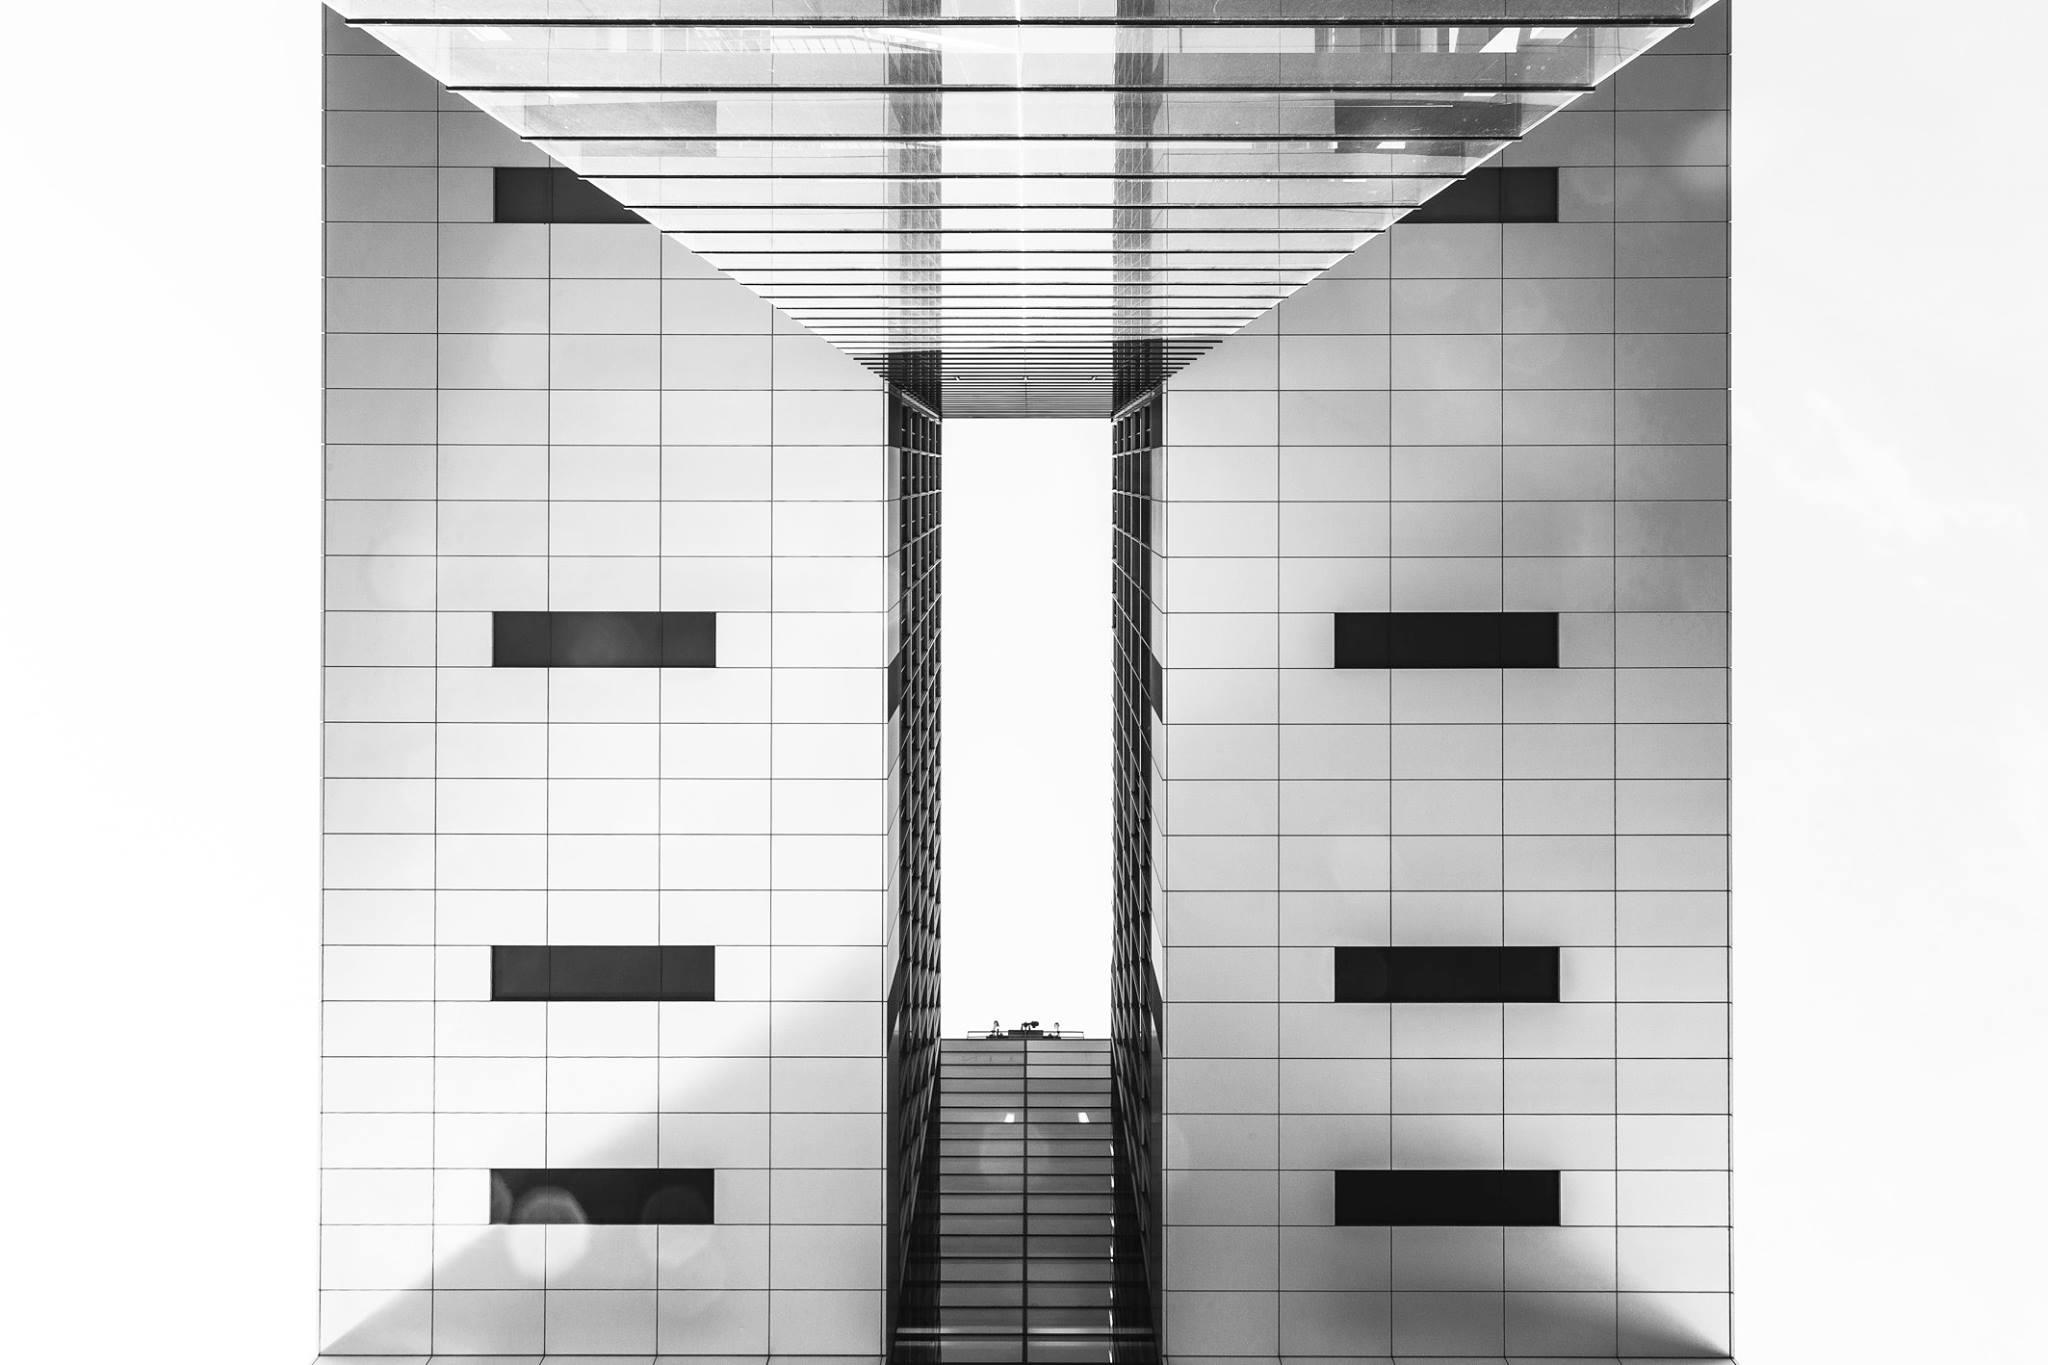 kevin-krautgartner-architecture-photography-06